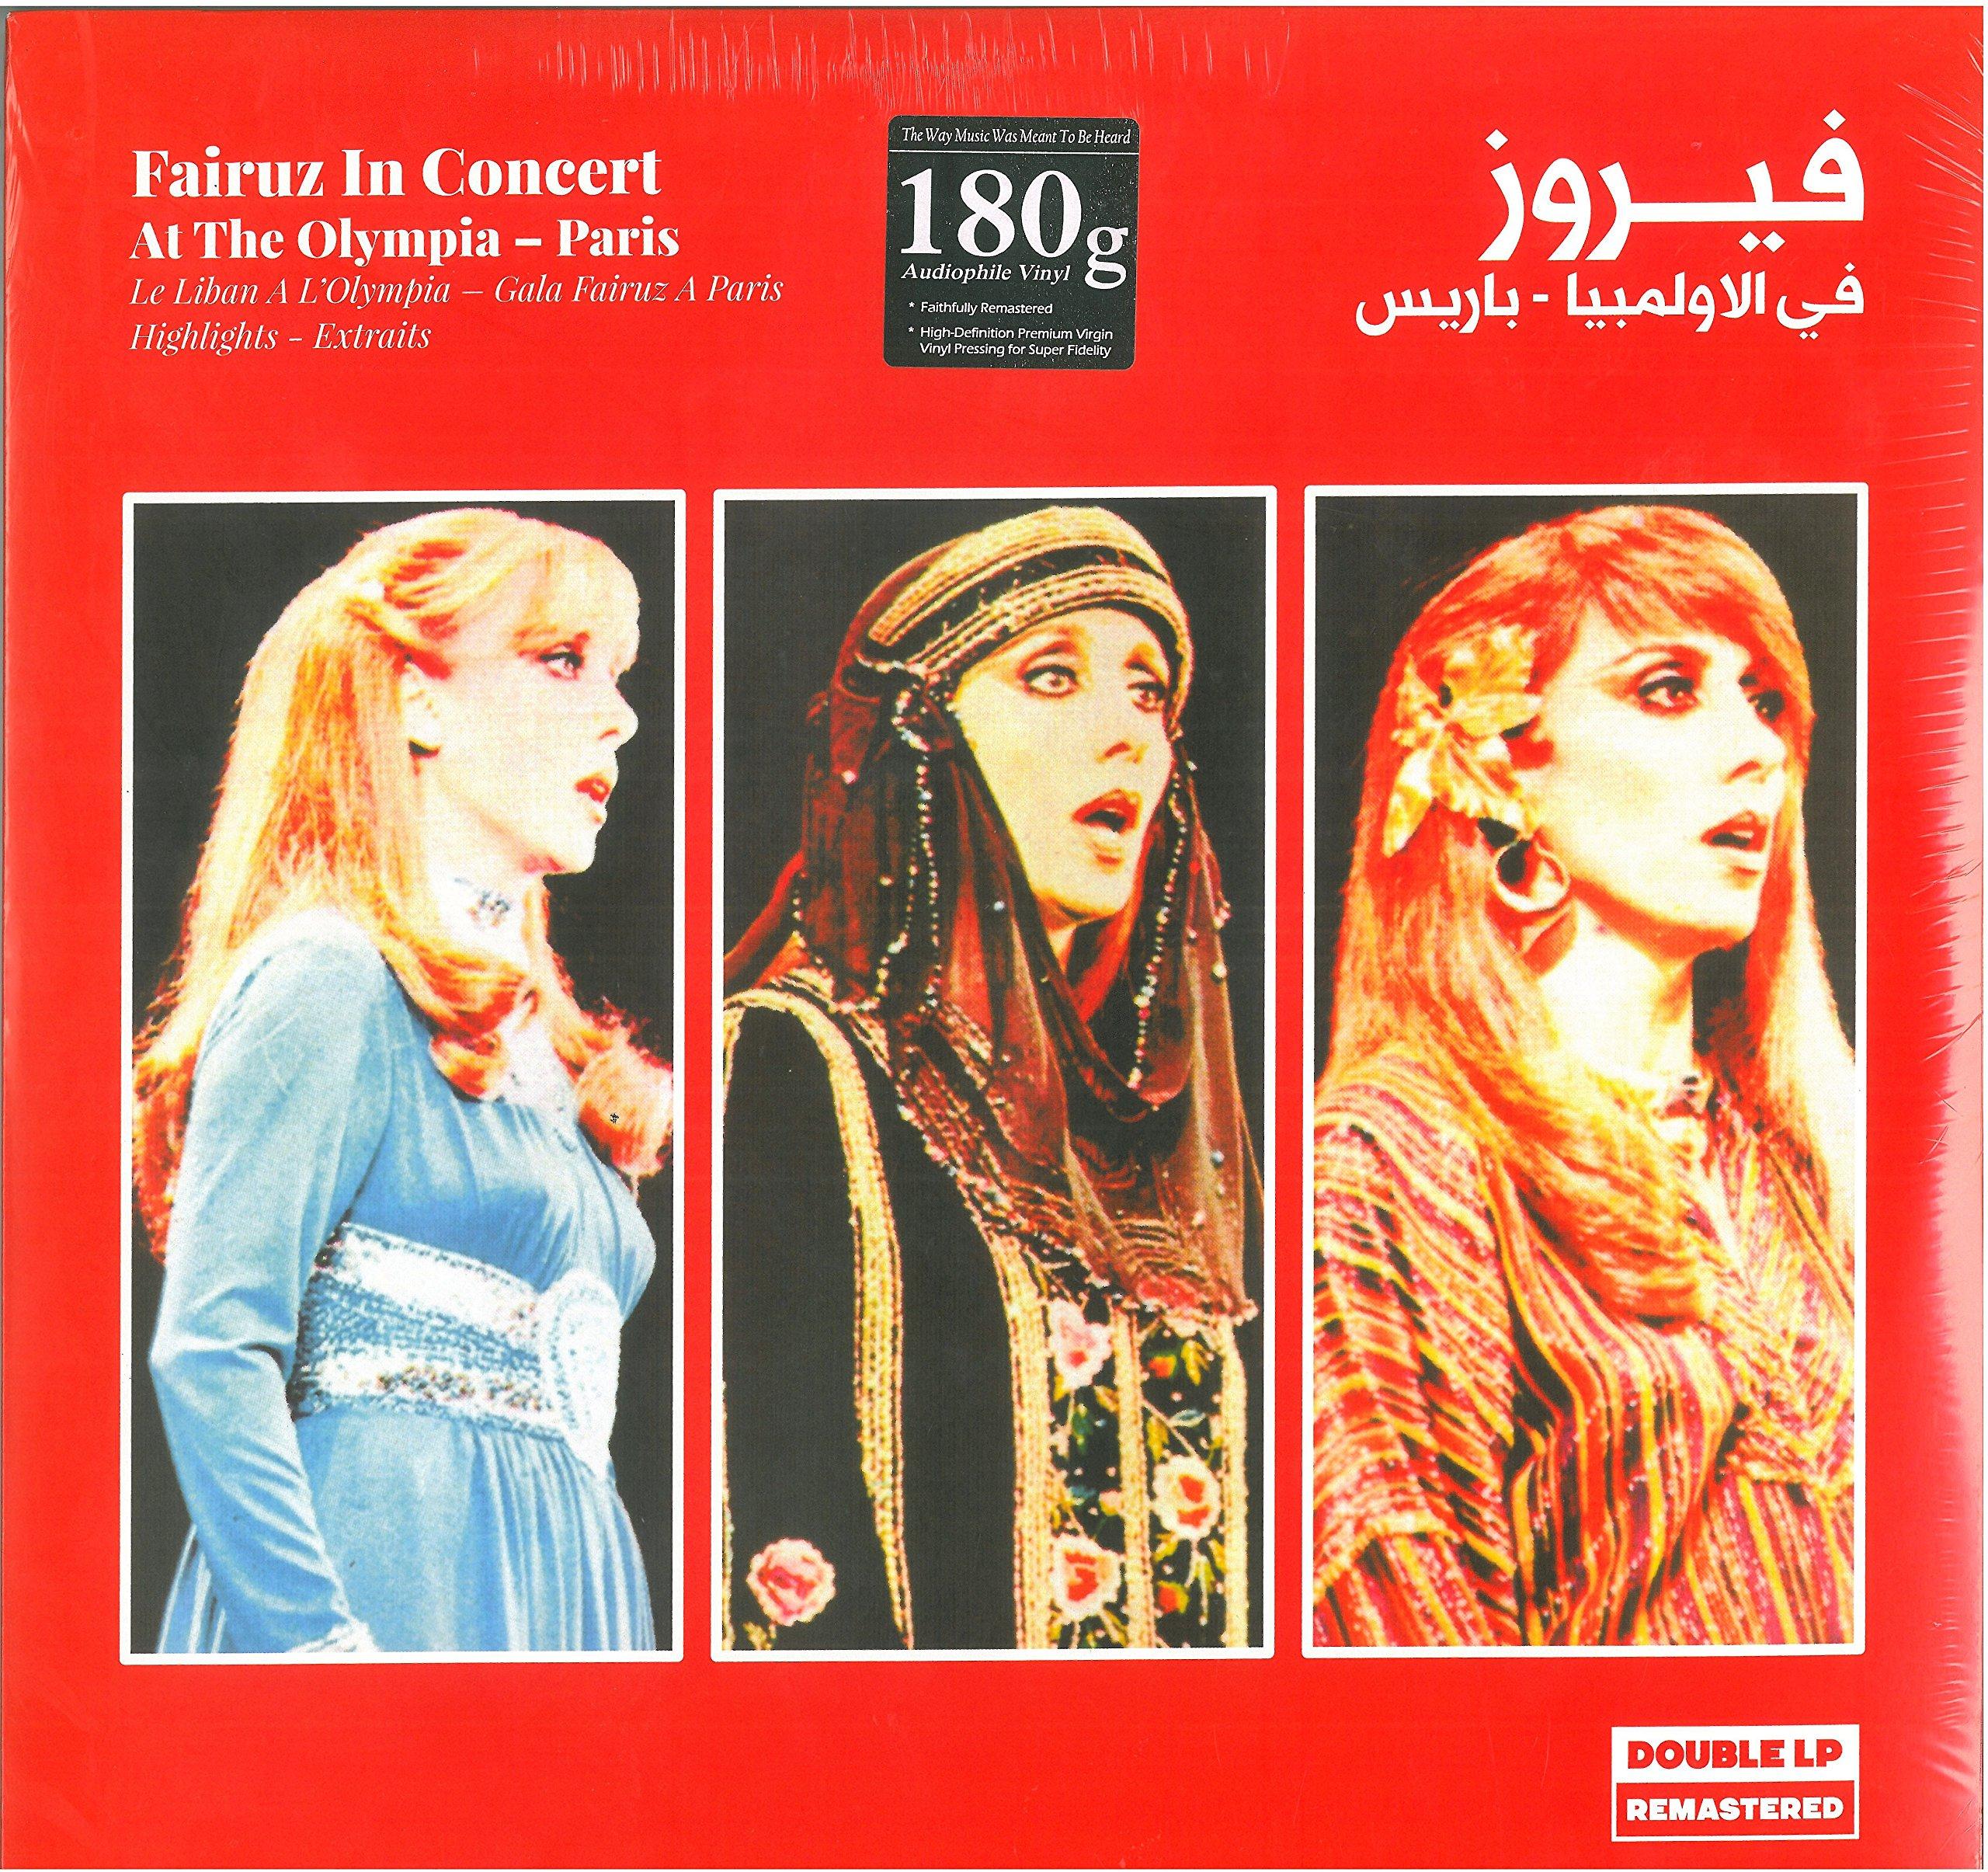 Fairuz In Concert At The Olympia-Paris ( Double LP Remastered Vinyl)